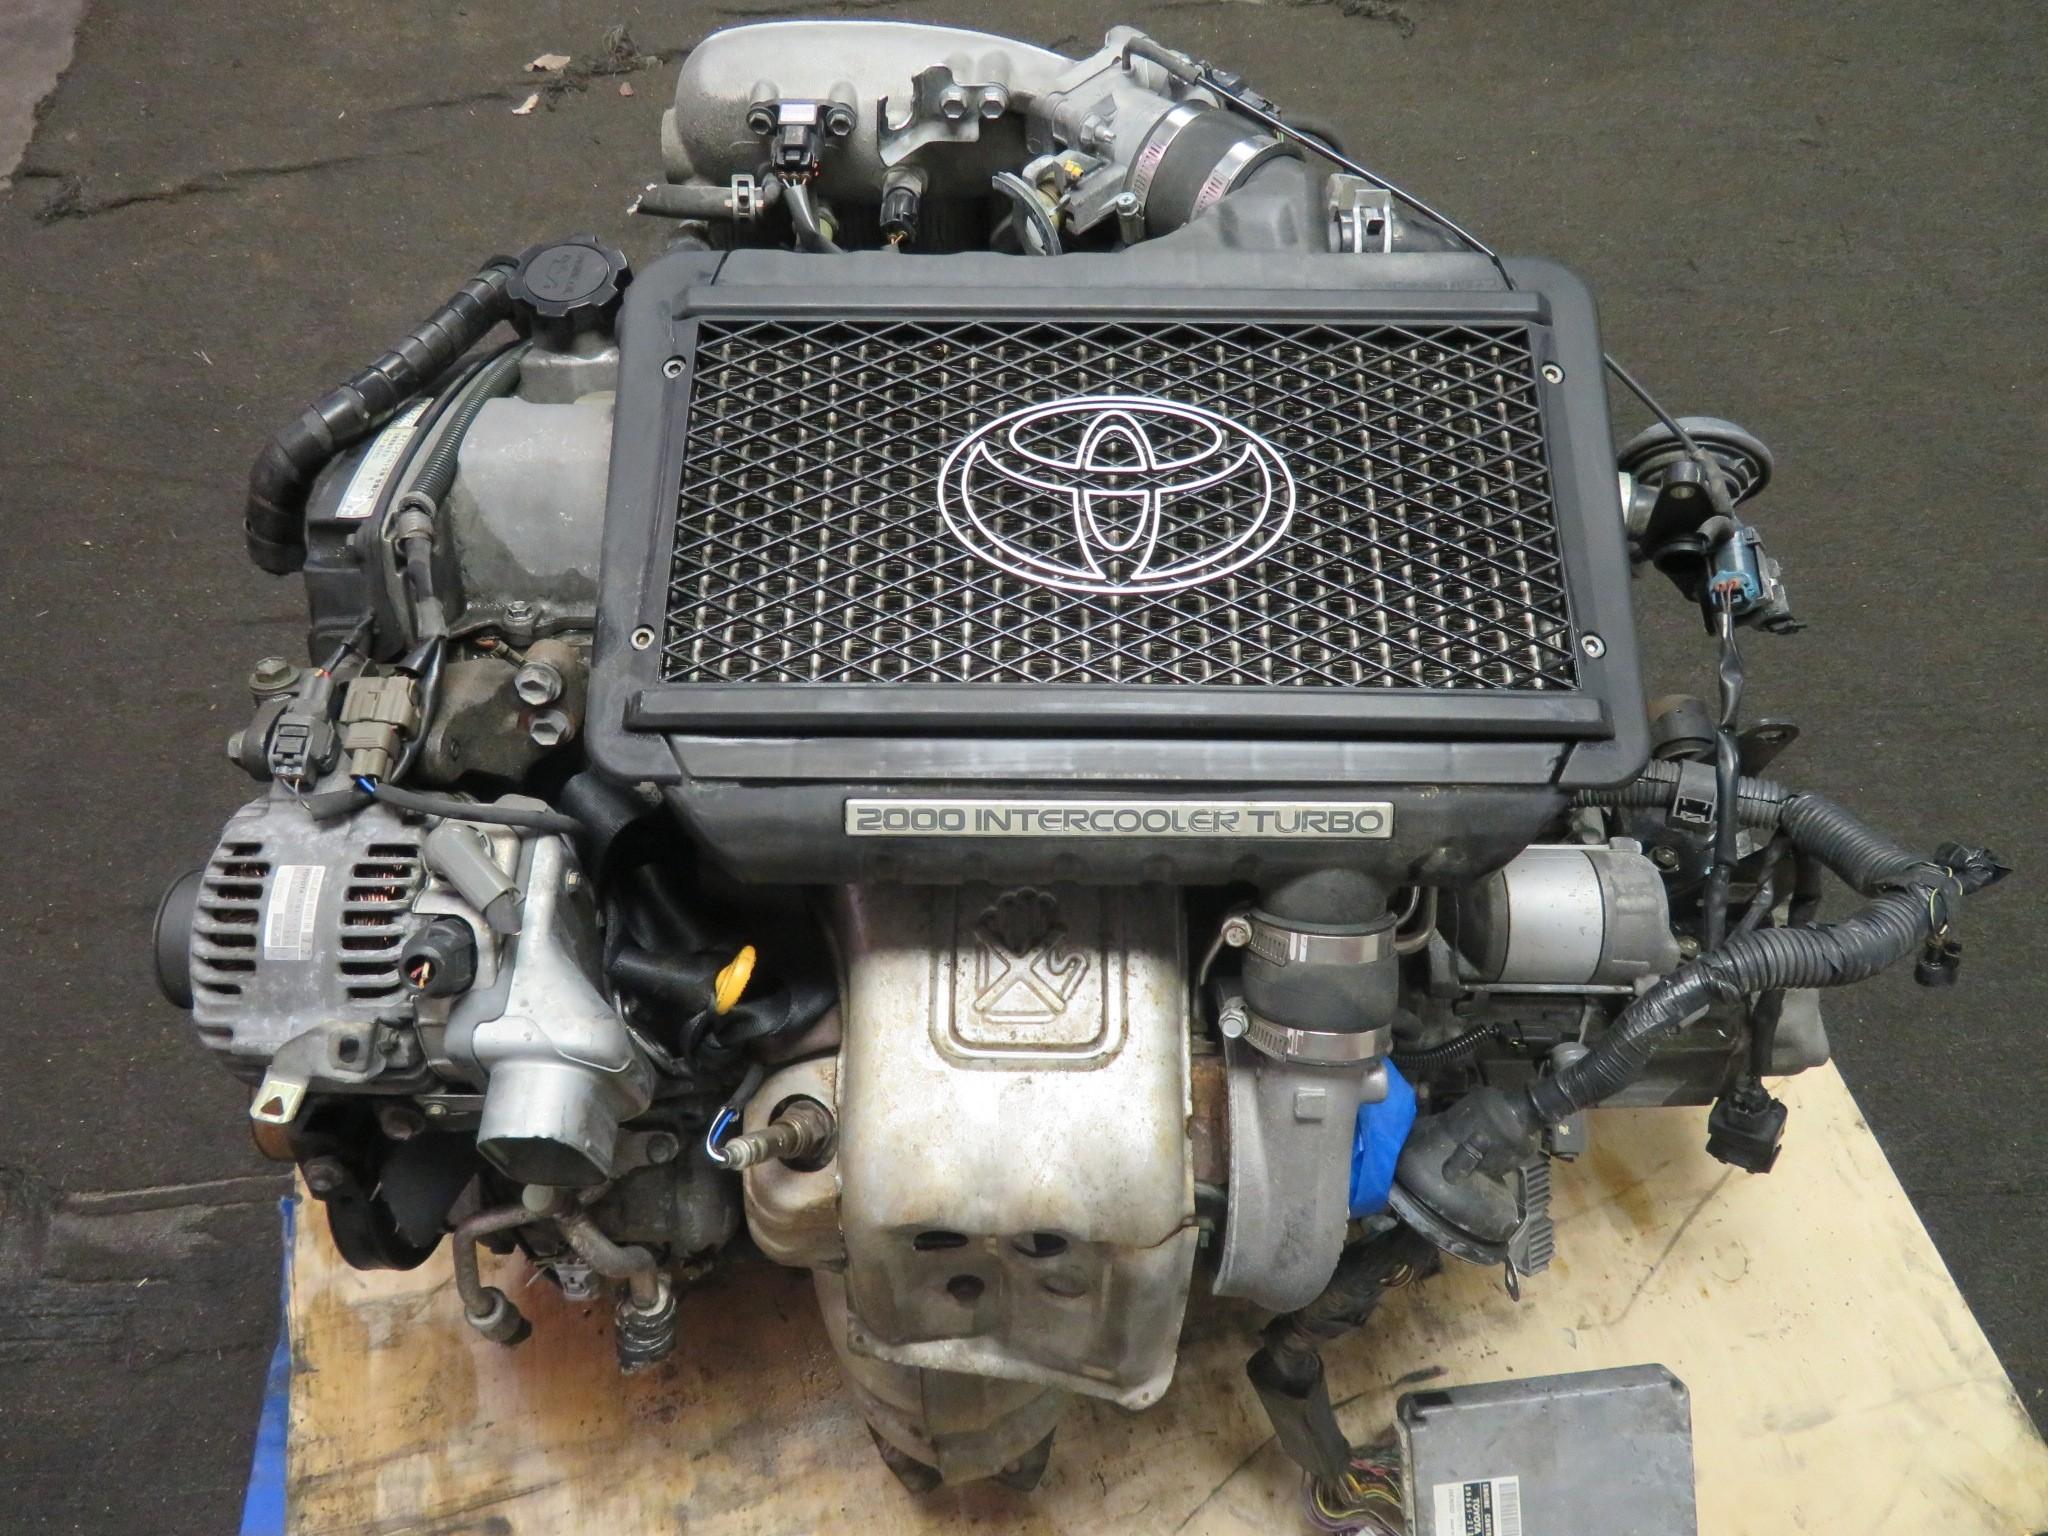 98-03 JDM TOYOTA CALDINA ST215 3SGTE 2.0L TURBO ENGINE, 5 SPEED AWD TRANSMISSION, WIRING HARNESS, ECU